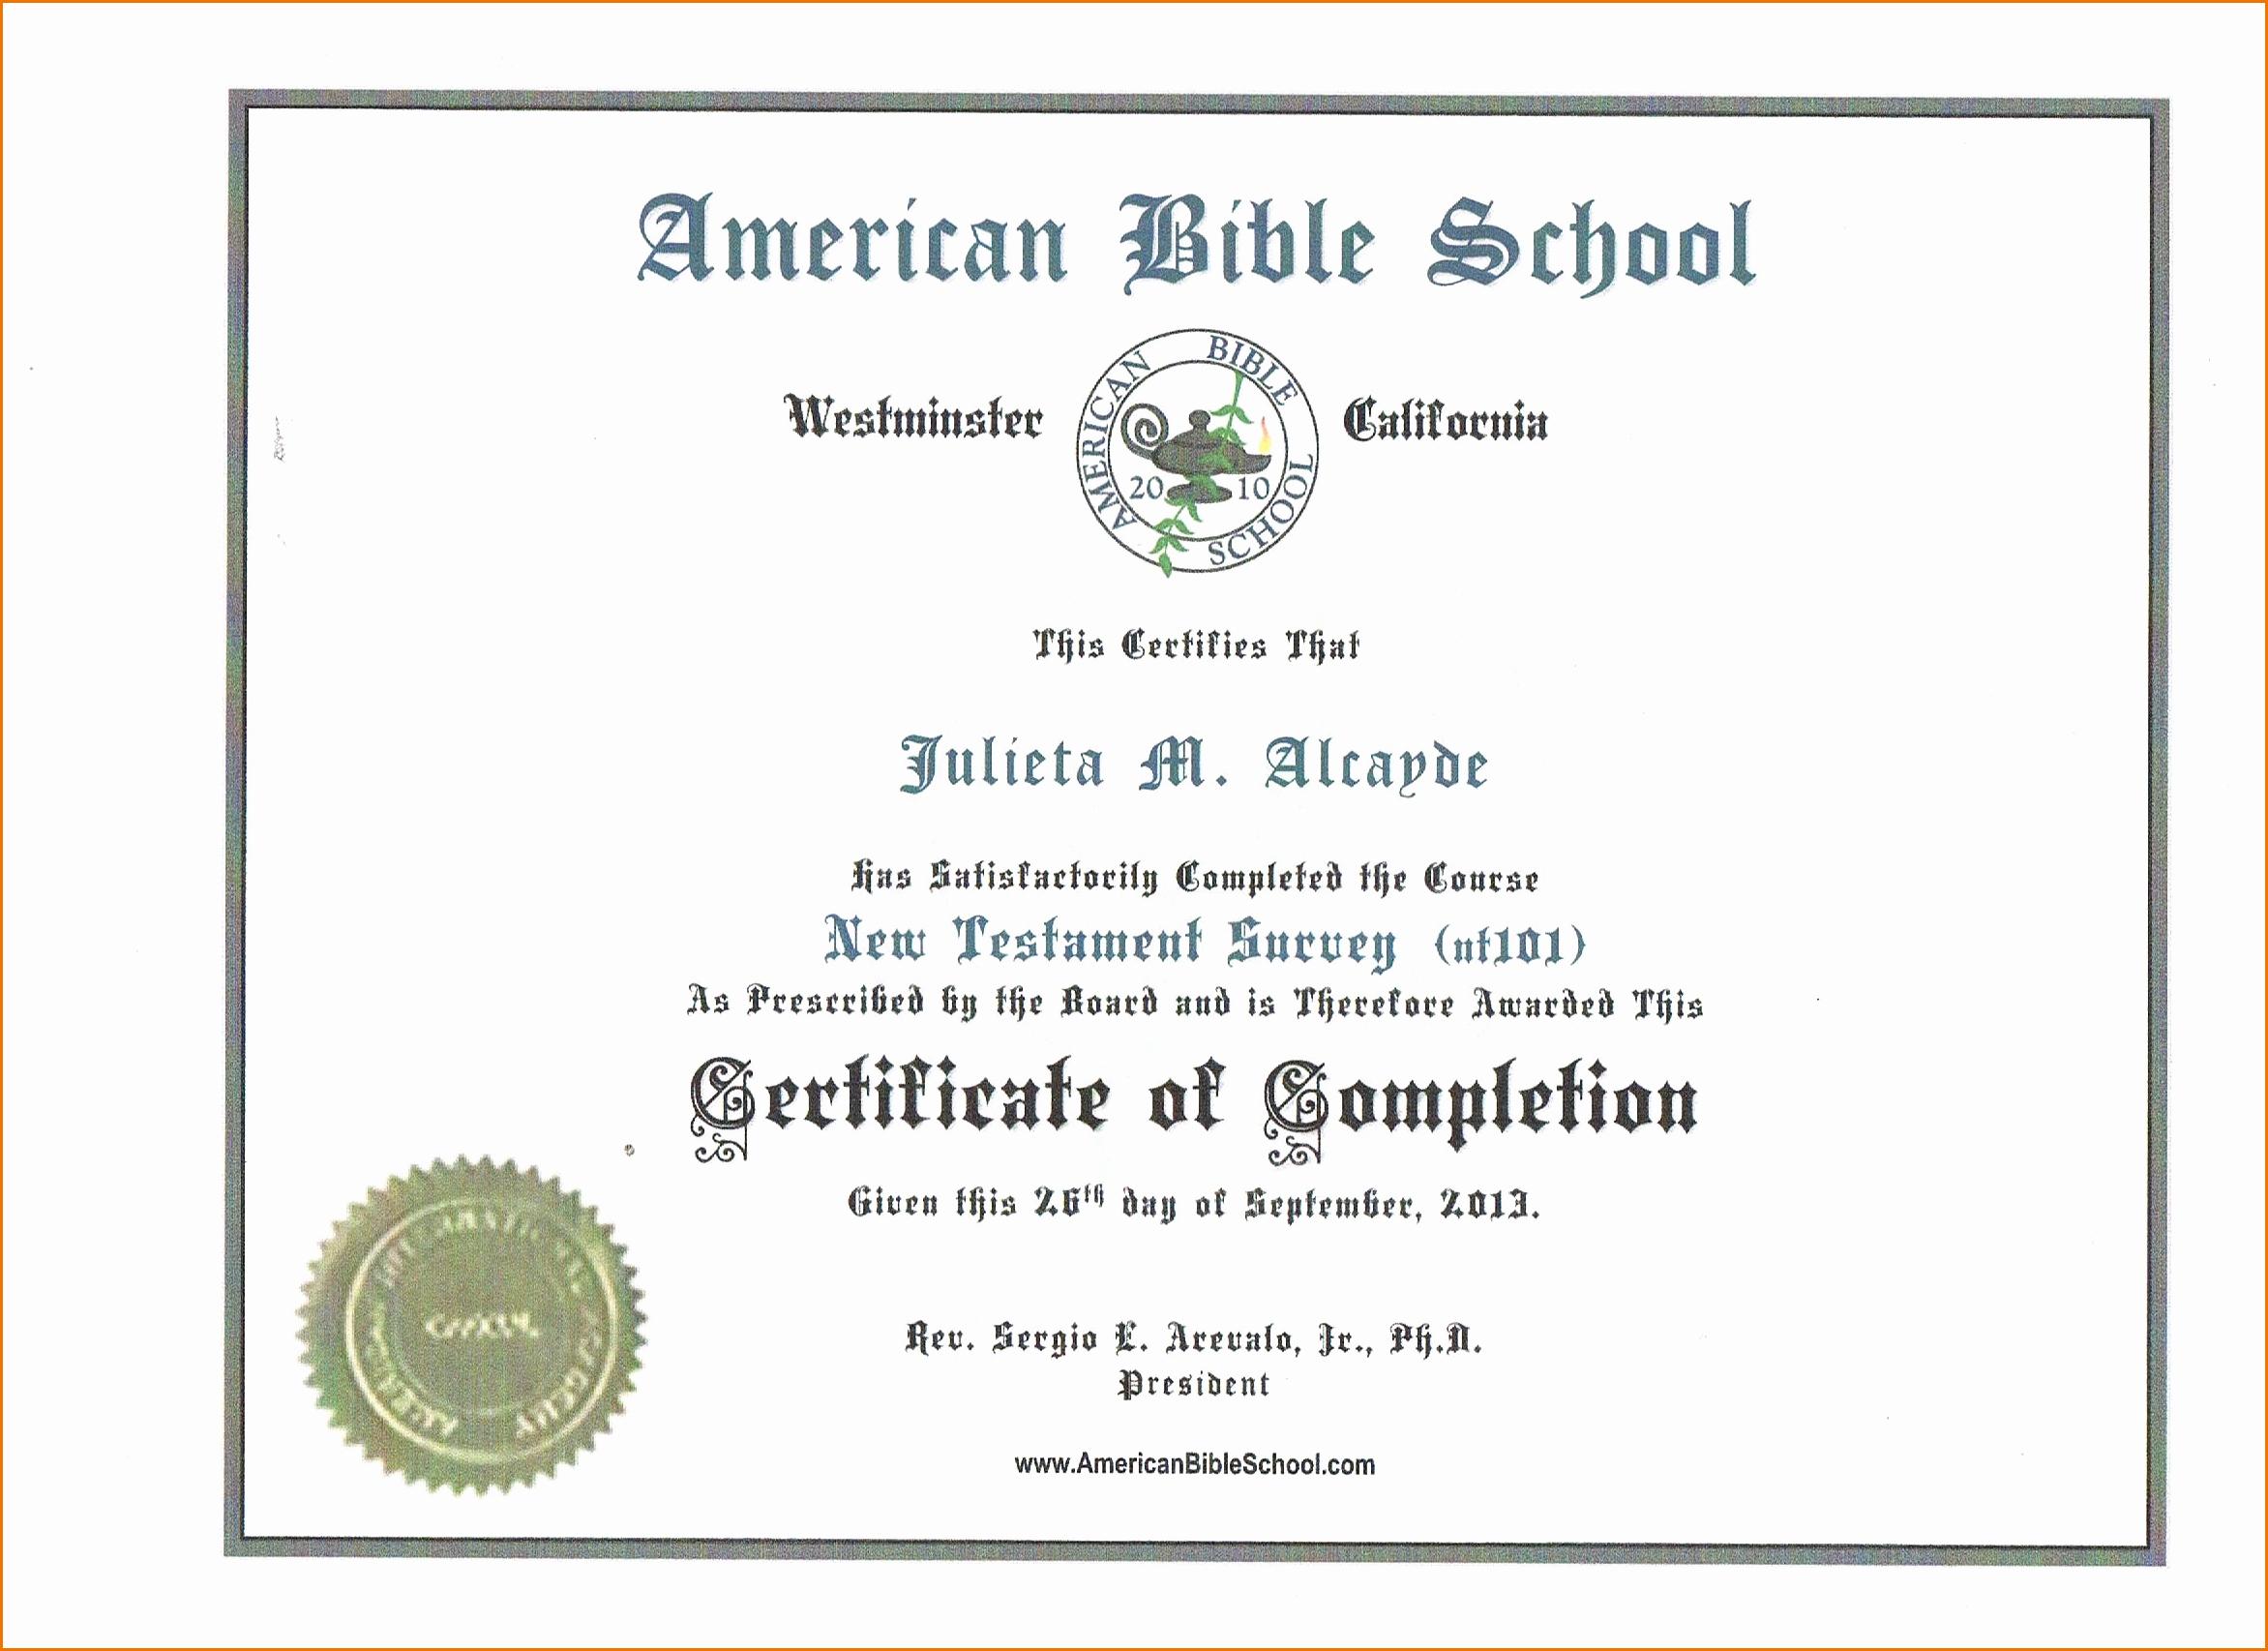 13 Certificate Of Pletion Templates Excel Pdf formats – Latter